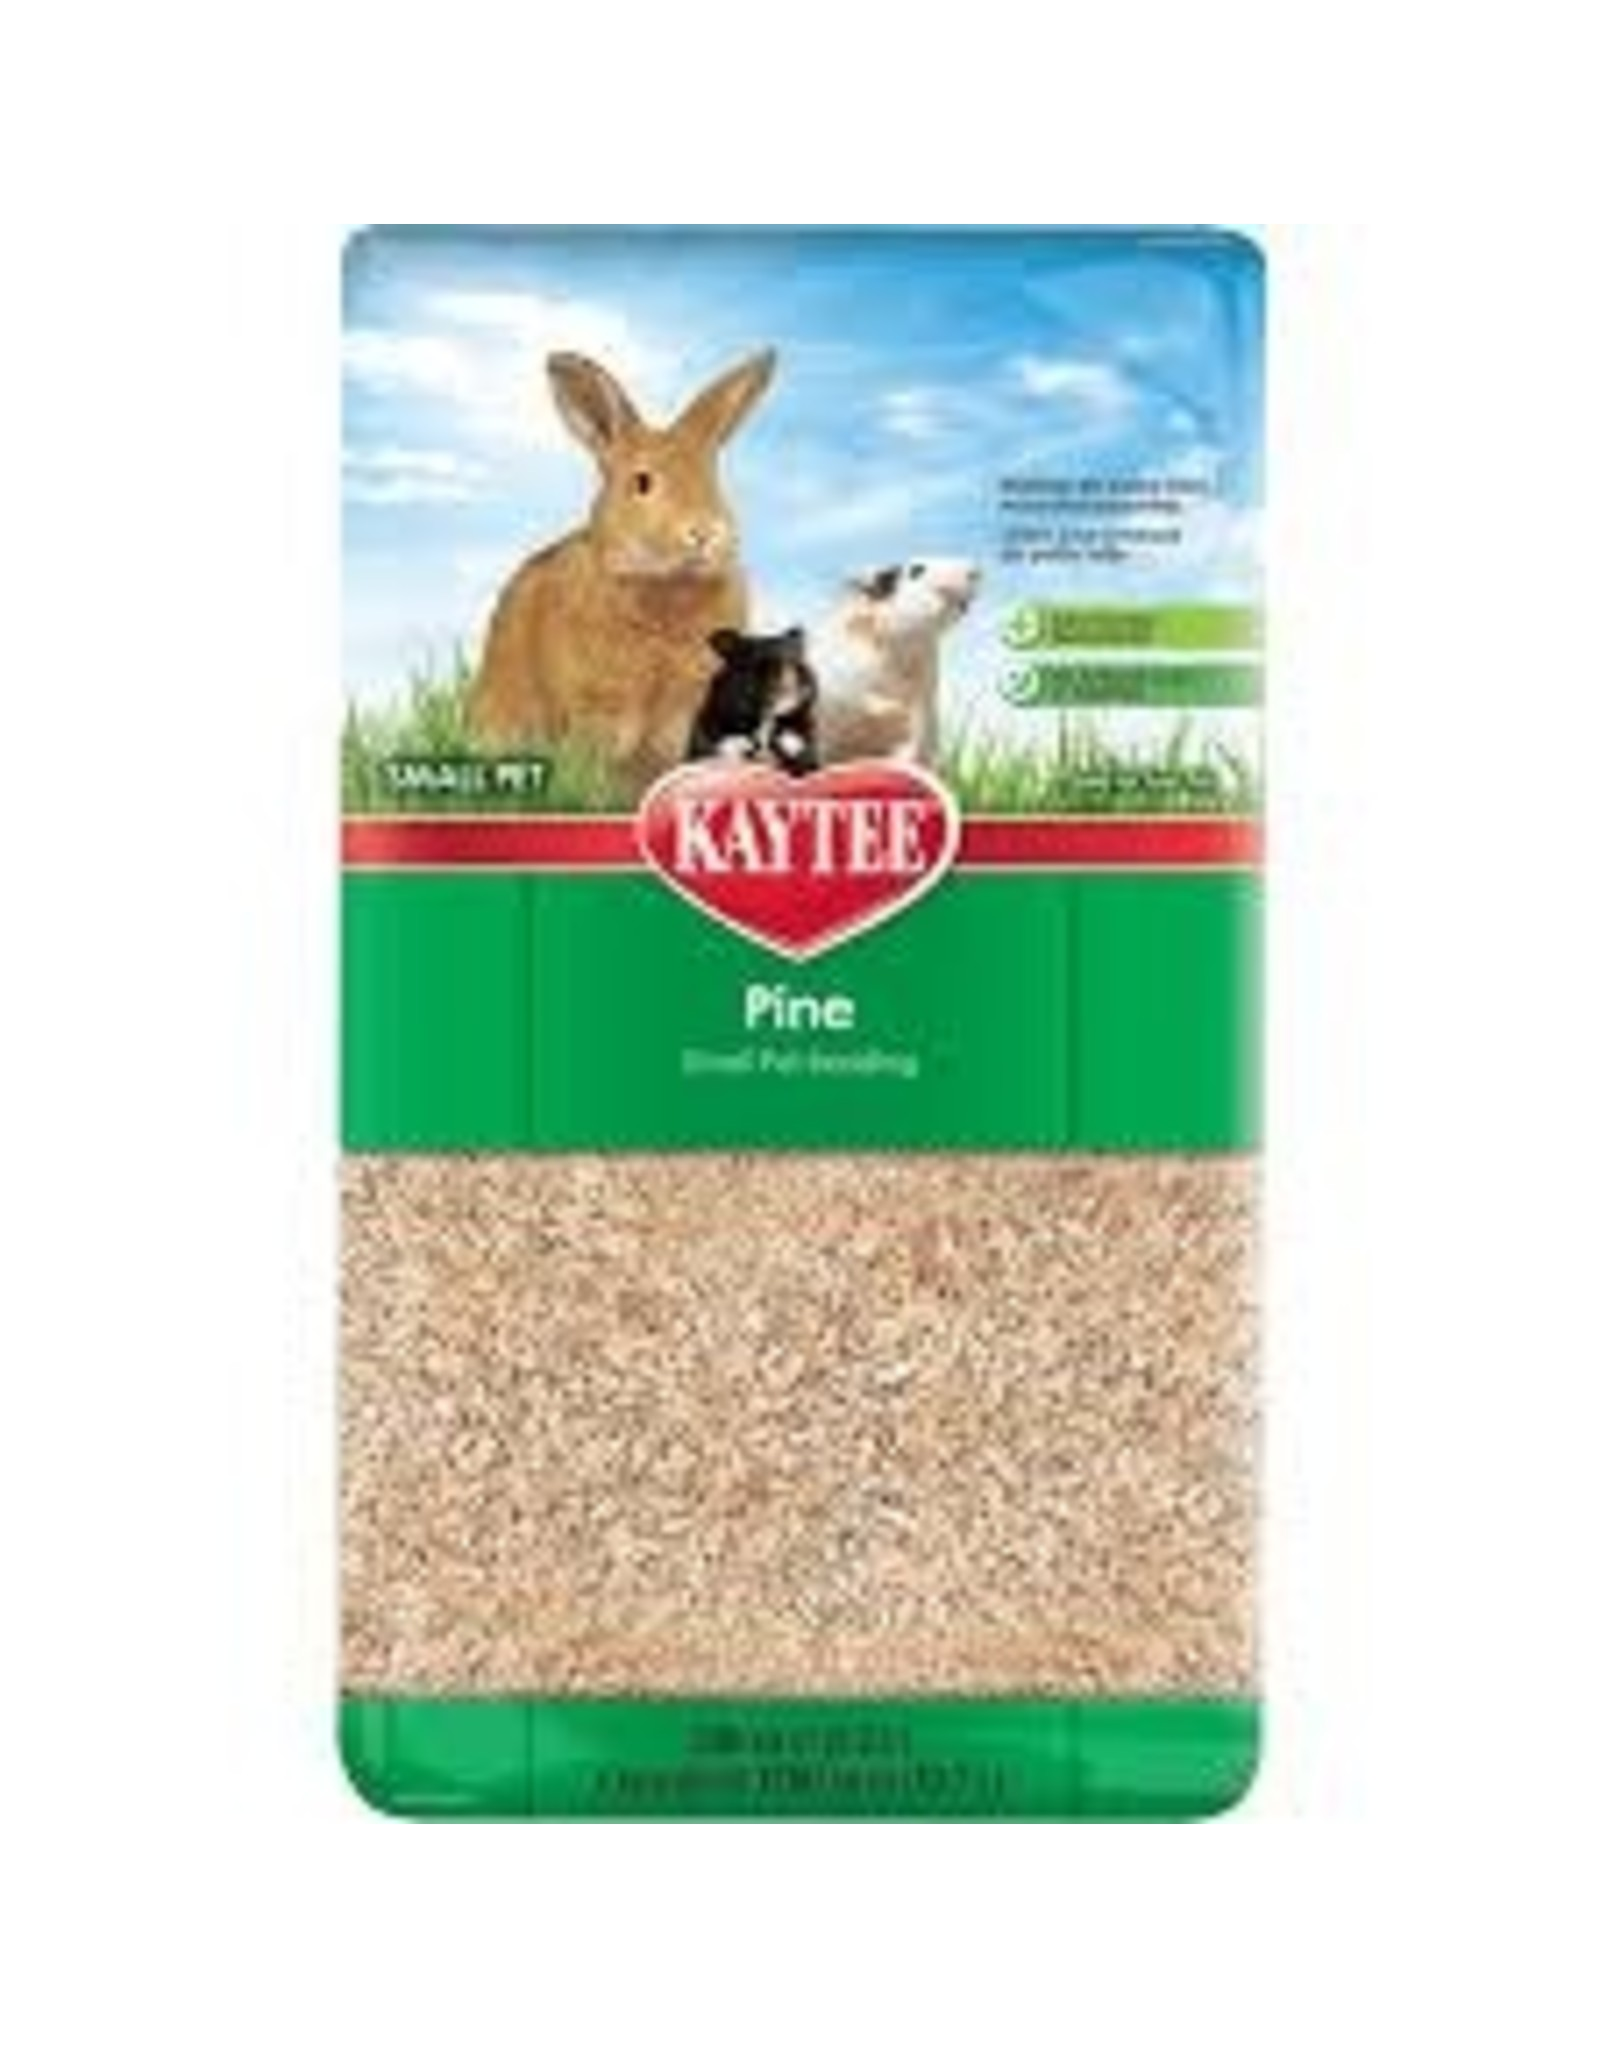 Kaytee Kaytee - Super Pet Pine bedding